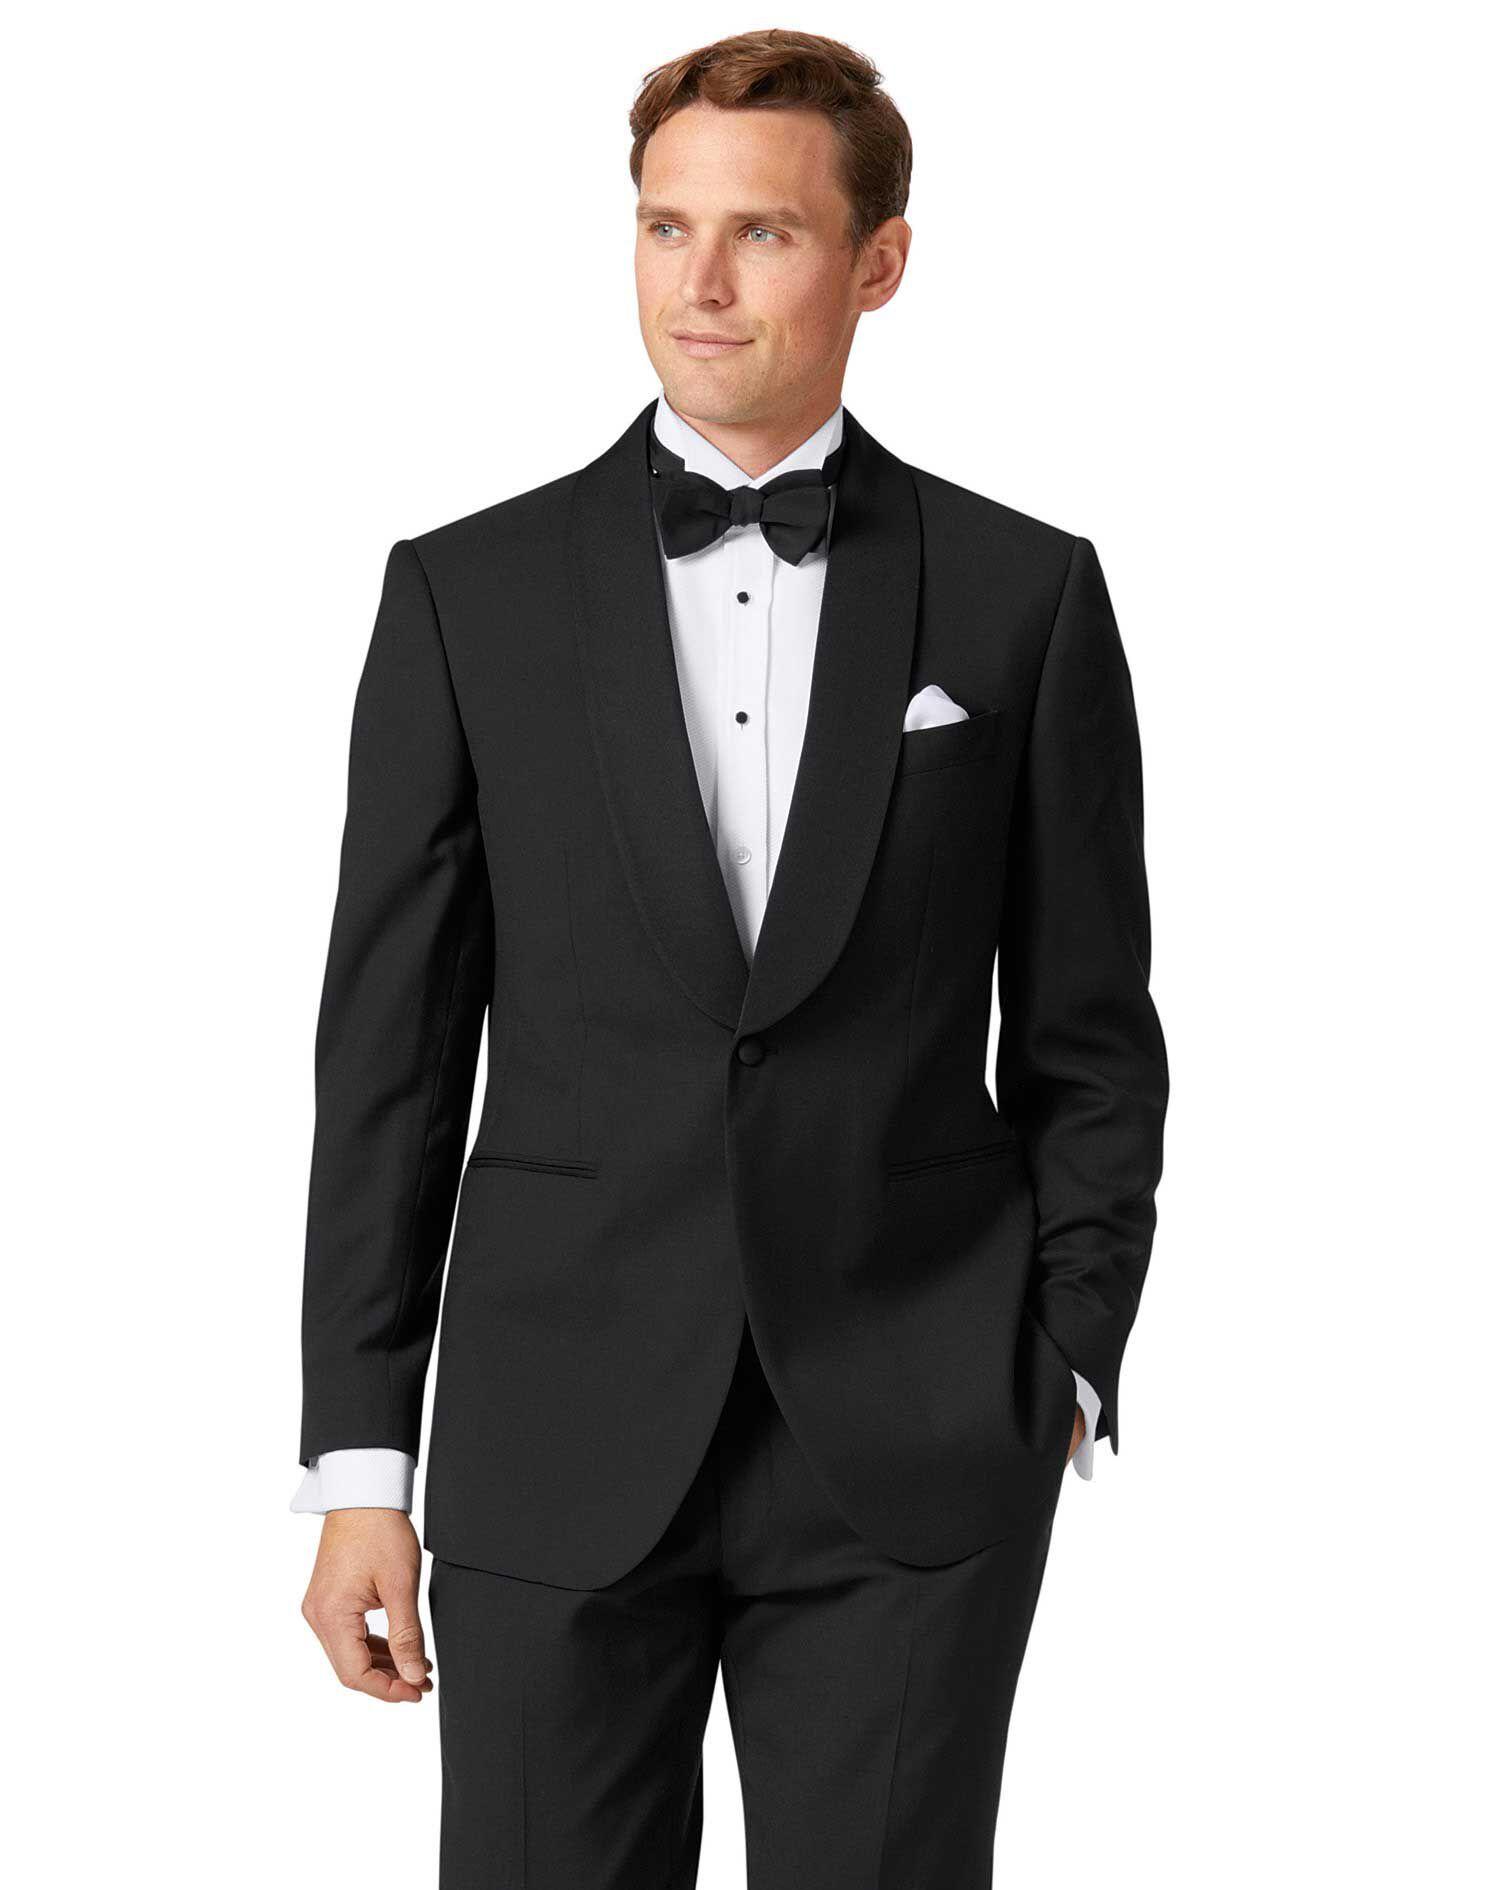 Black Slim Fit Shawl Collar Tuxedo Wool Jacket Size 46 by Charles Tyrwhitt